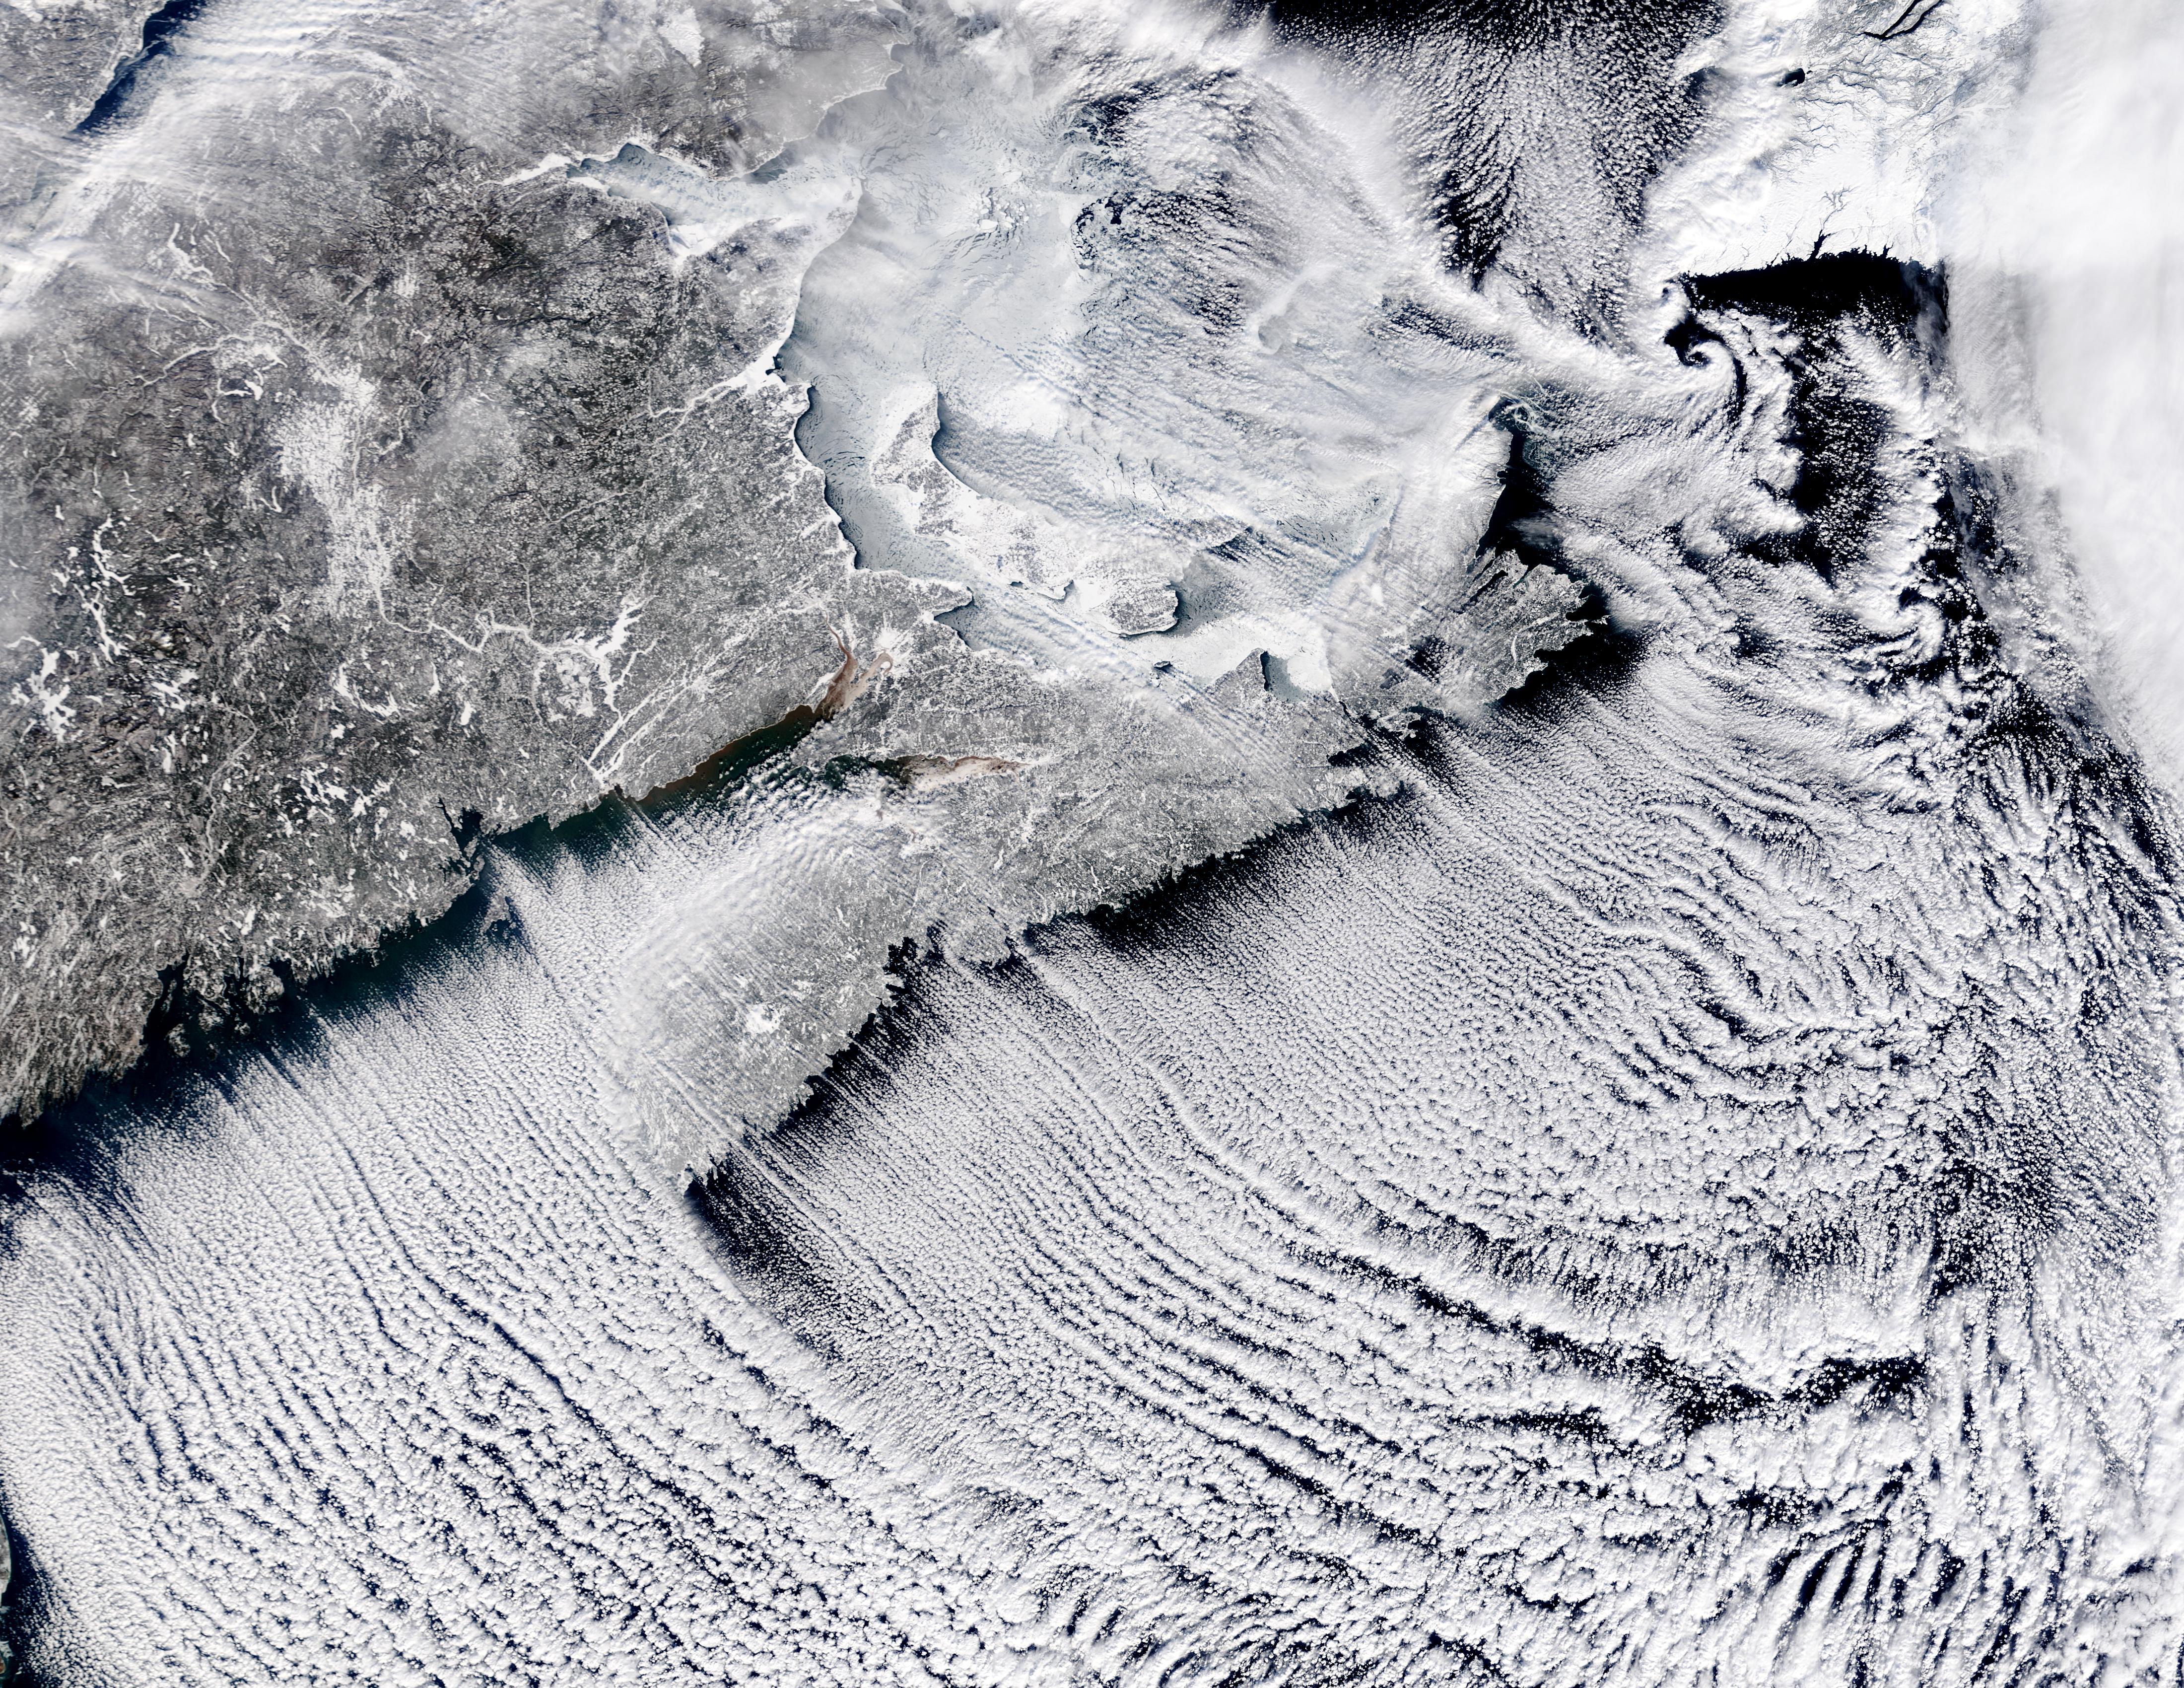 Calles de nubes cerca de Nova Scotia, Canadá